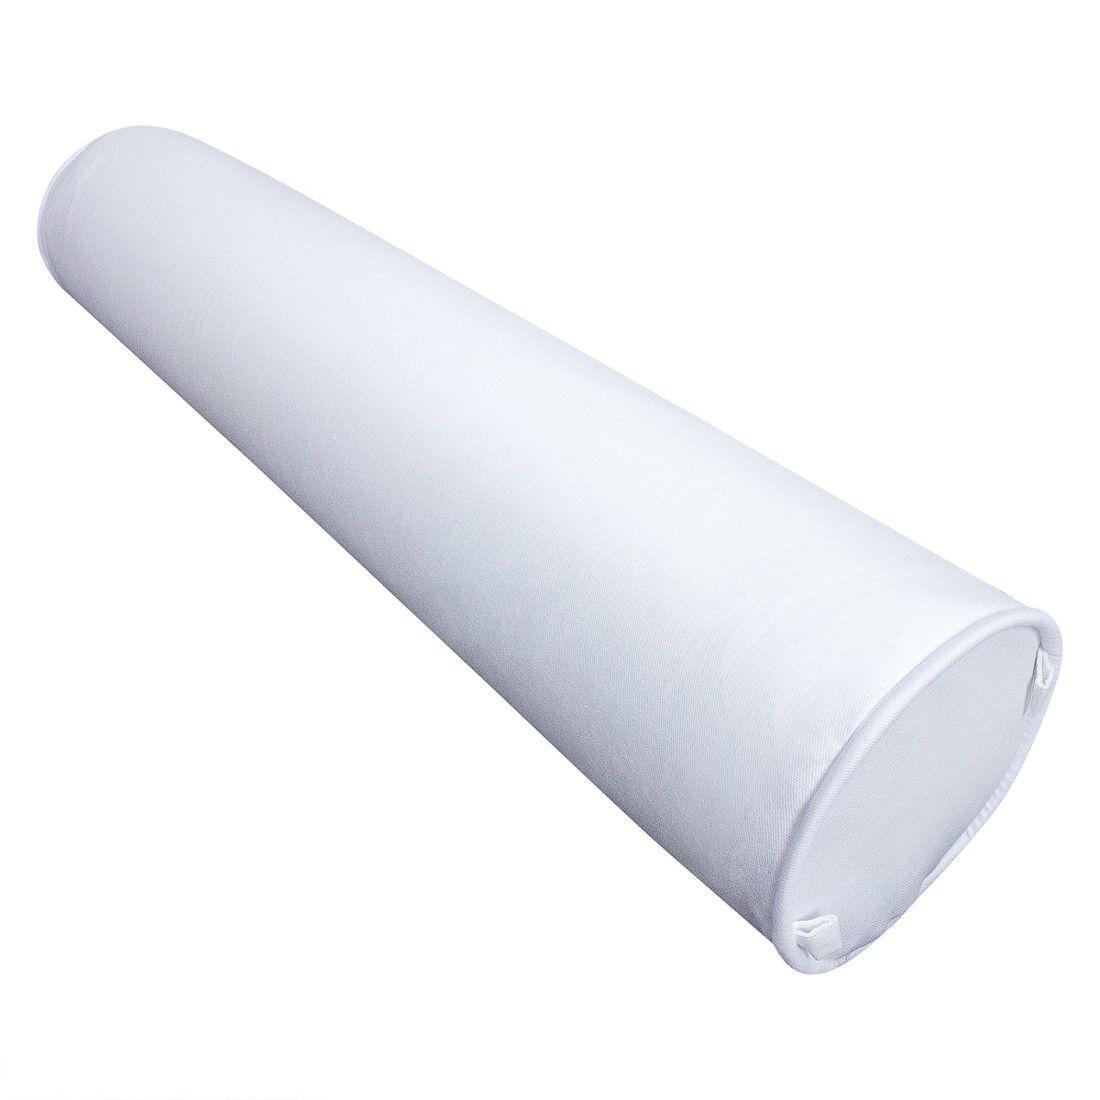 Rolo para cama 90 cm branco